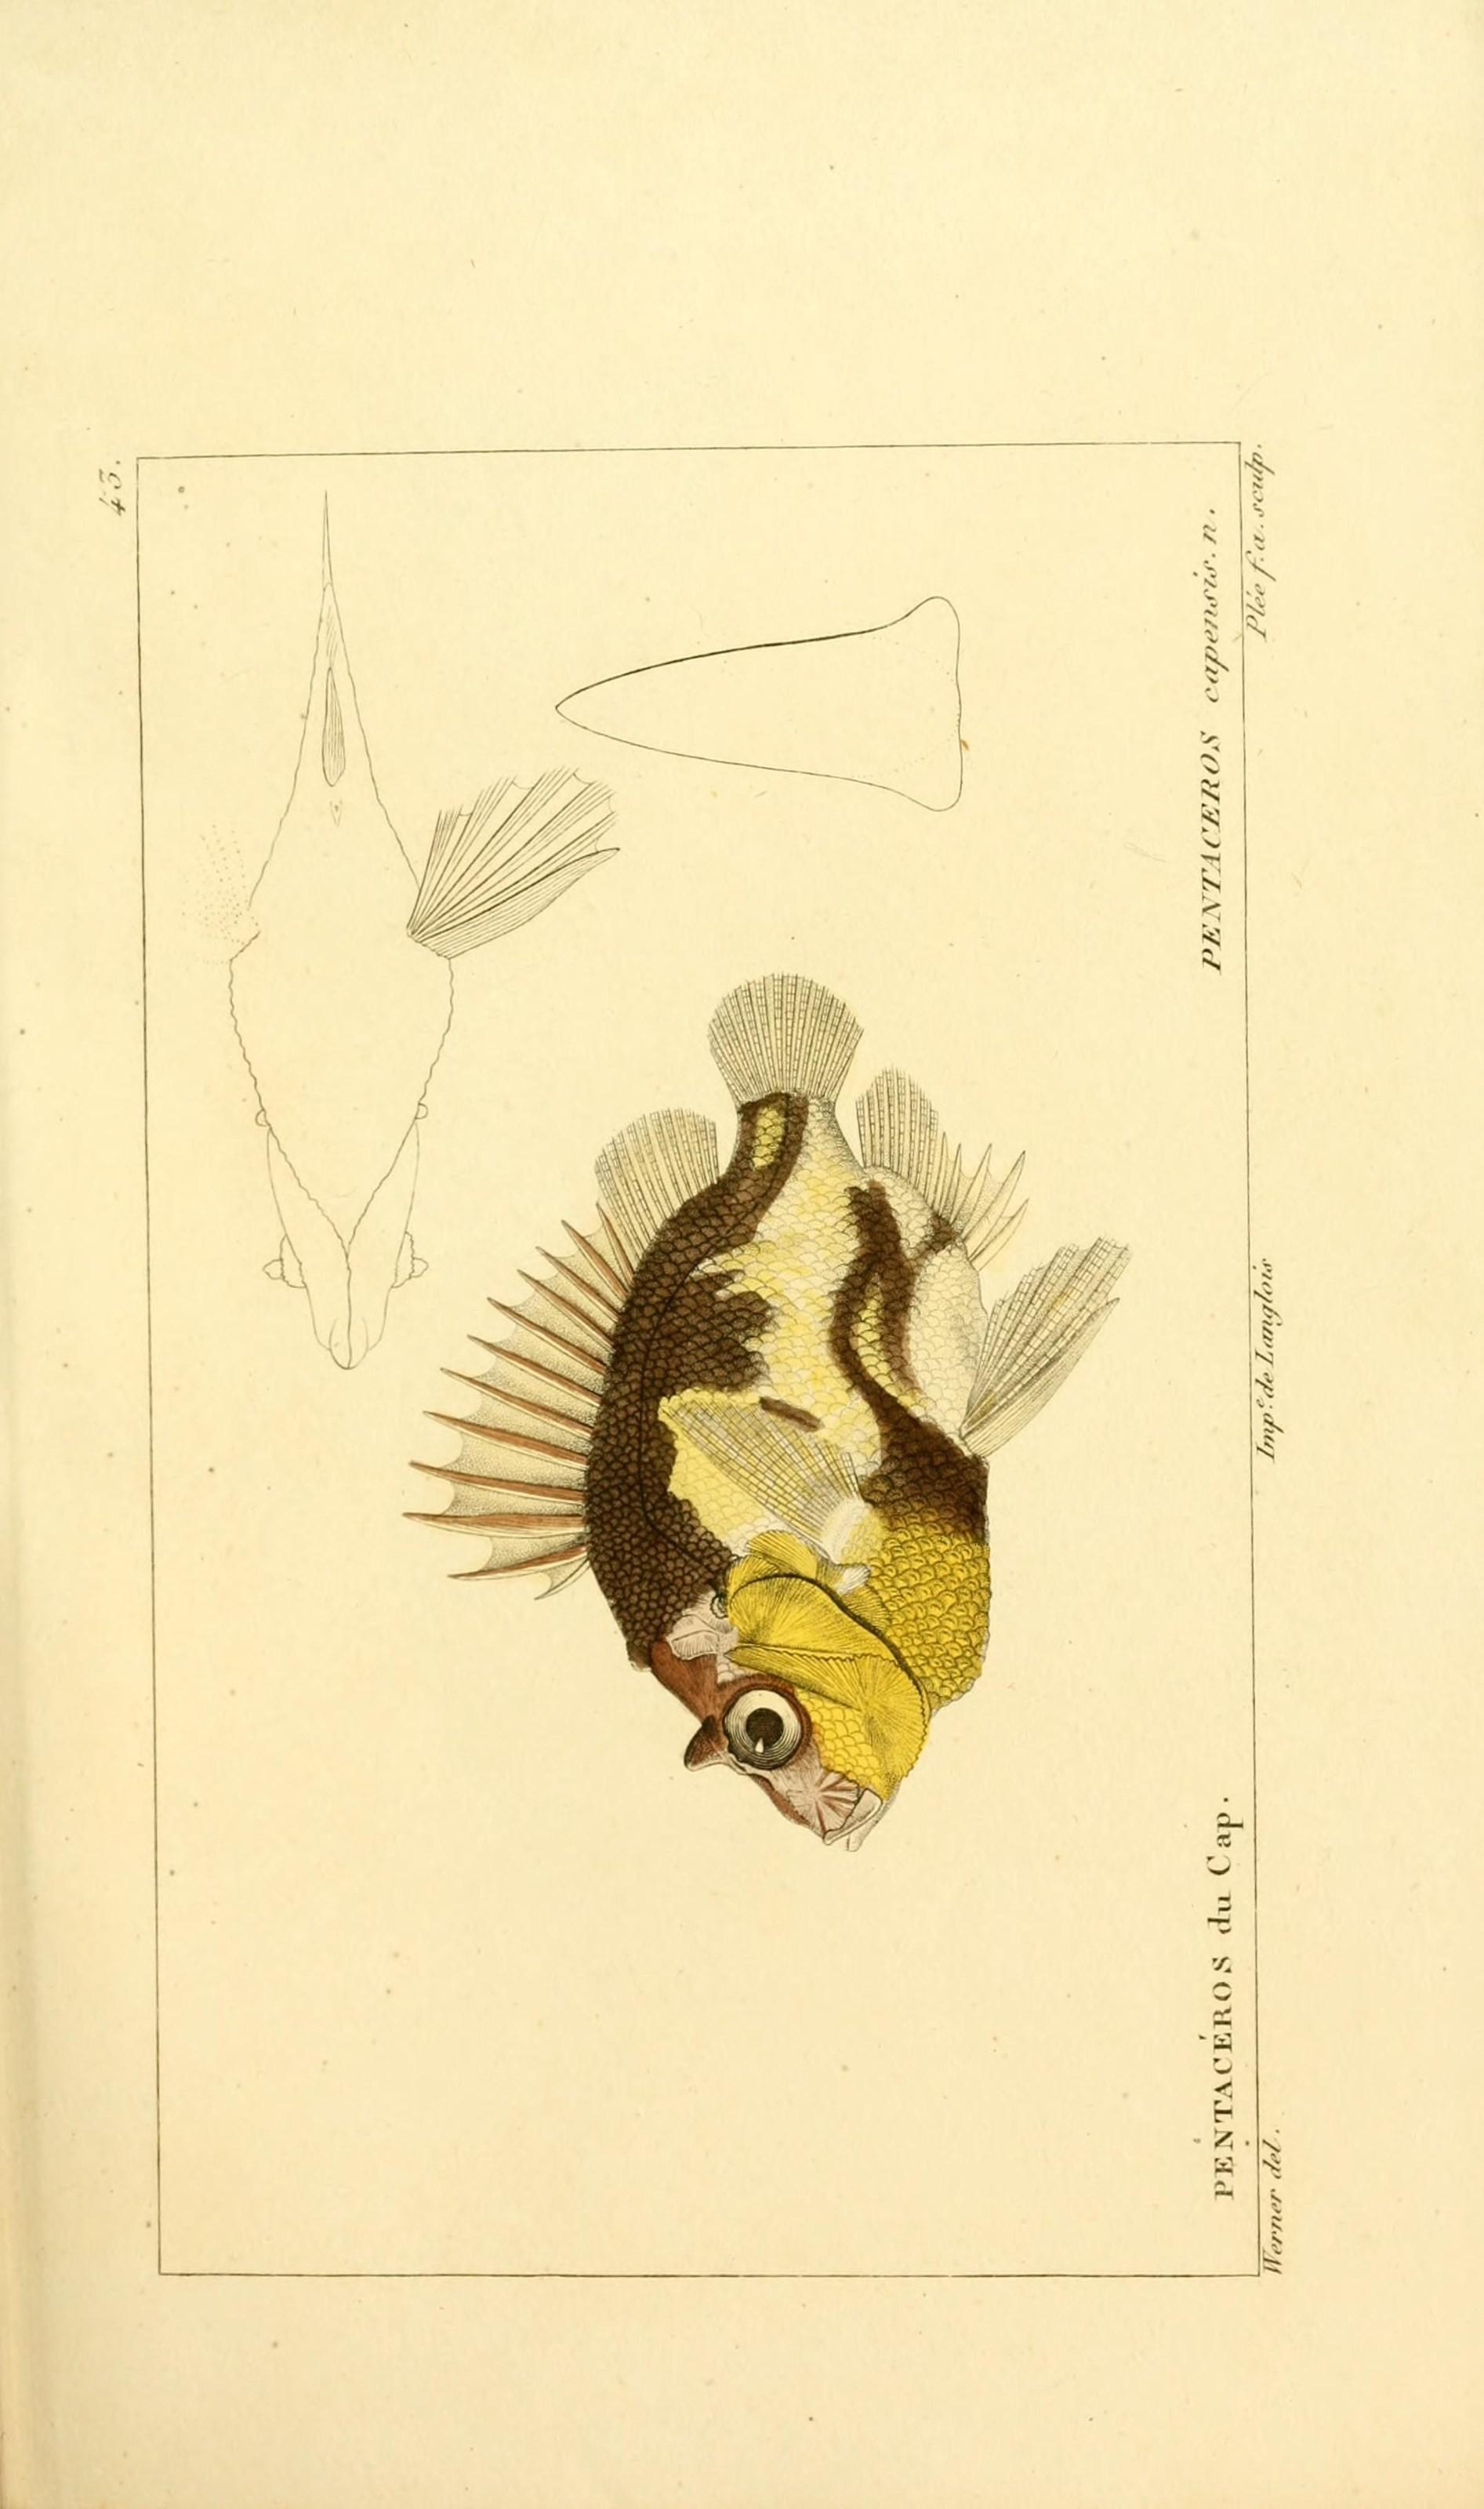 Image of Cape armorhead